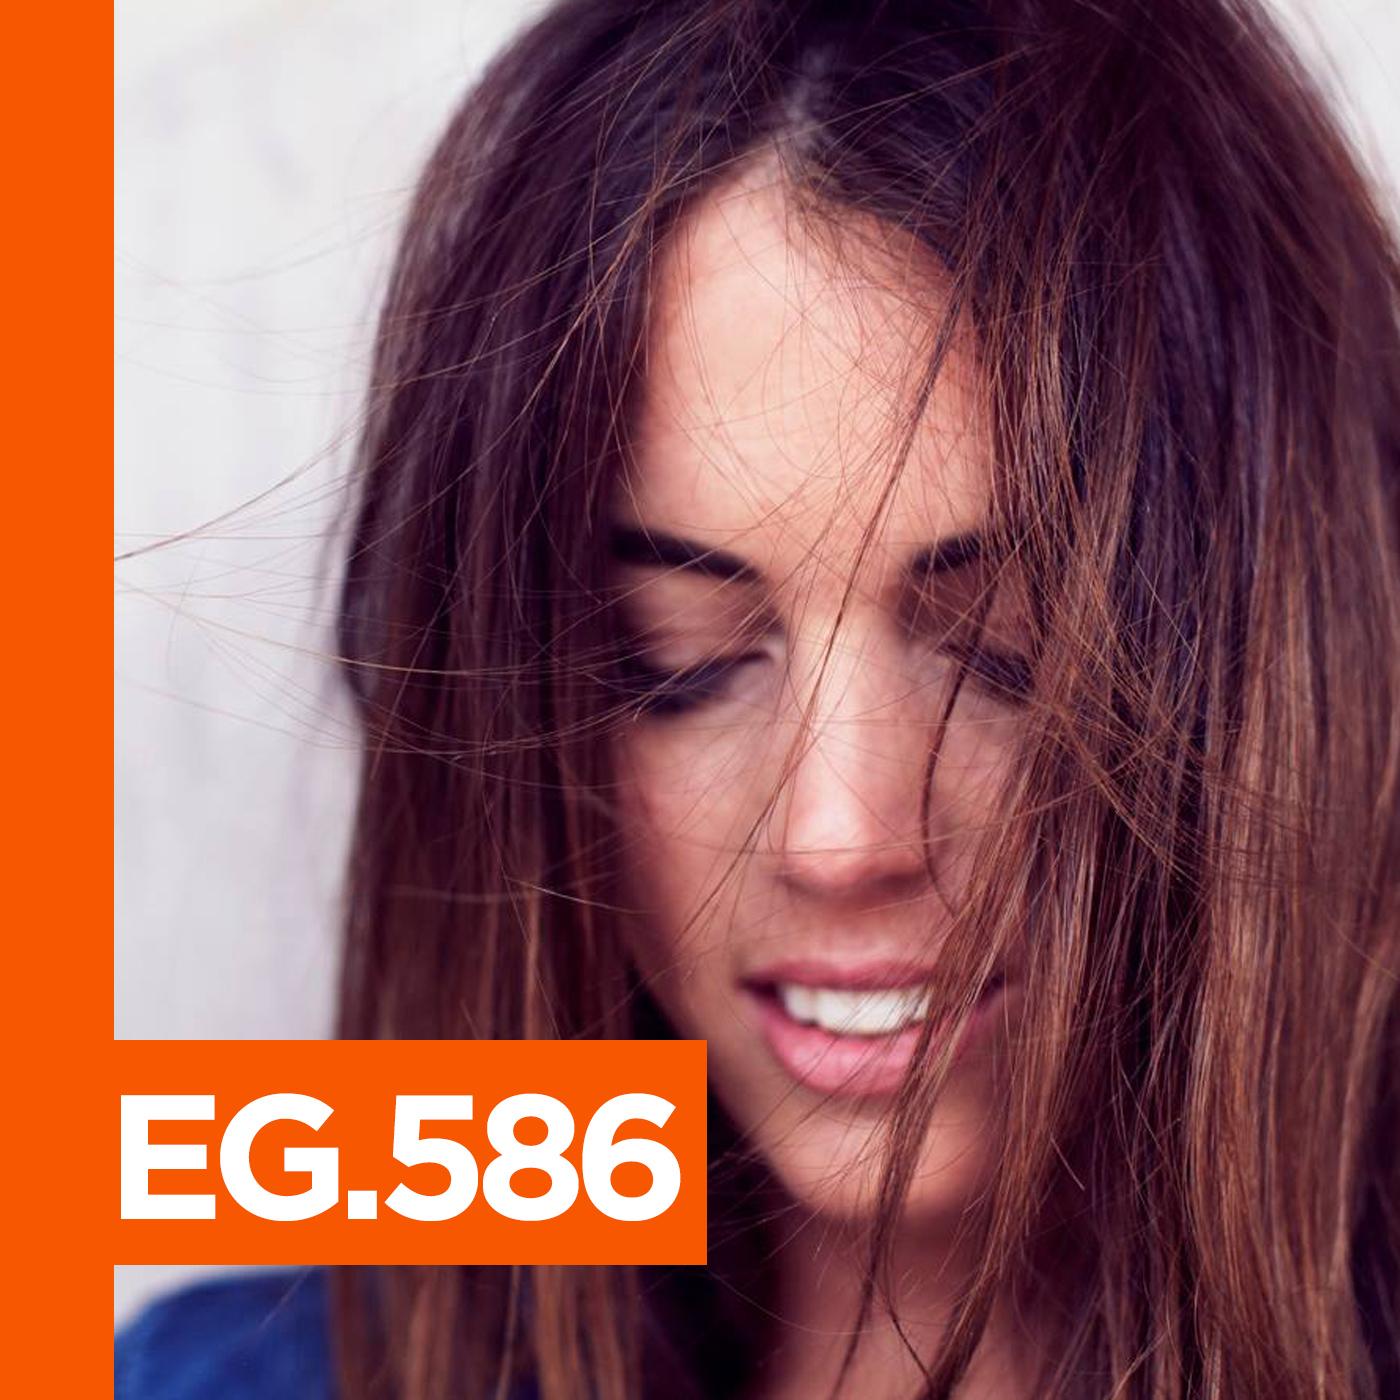 EG.586 Carly Foxx